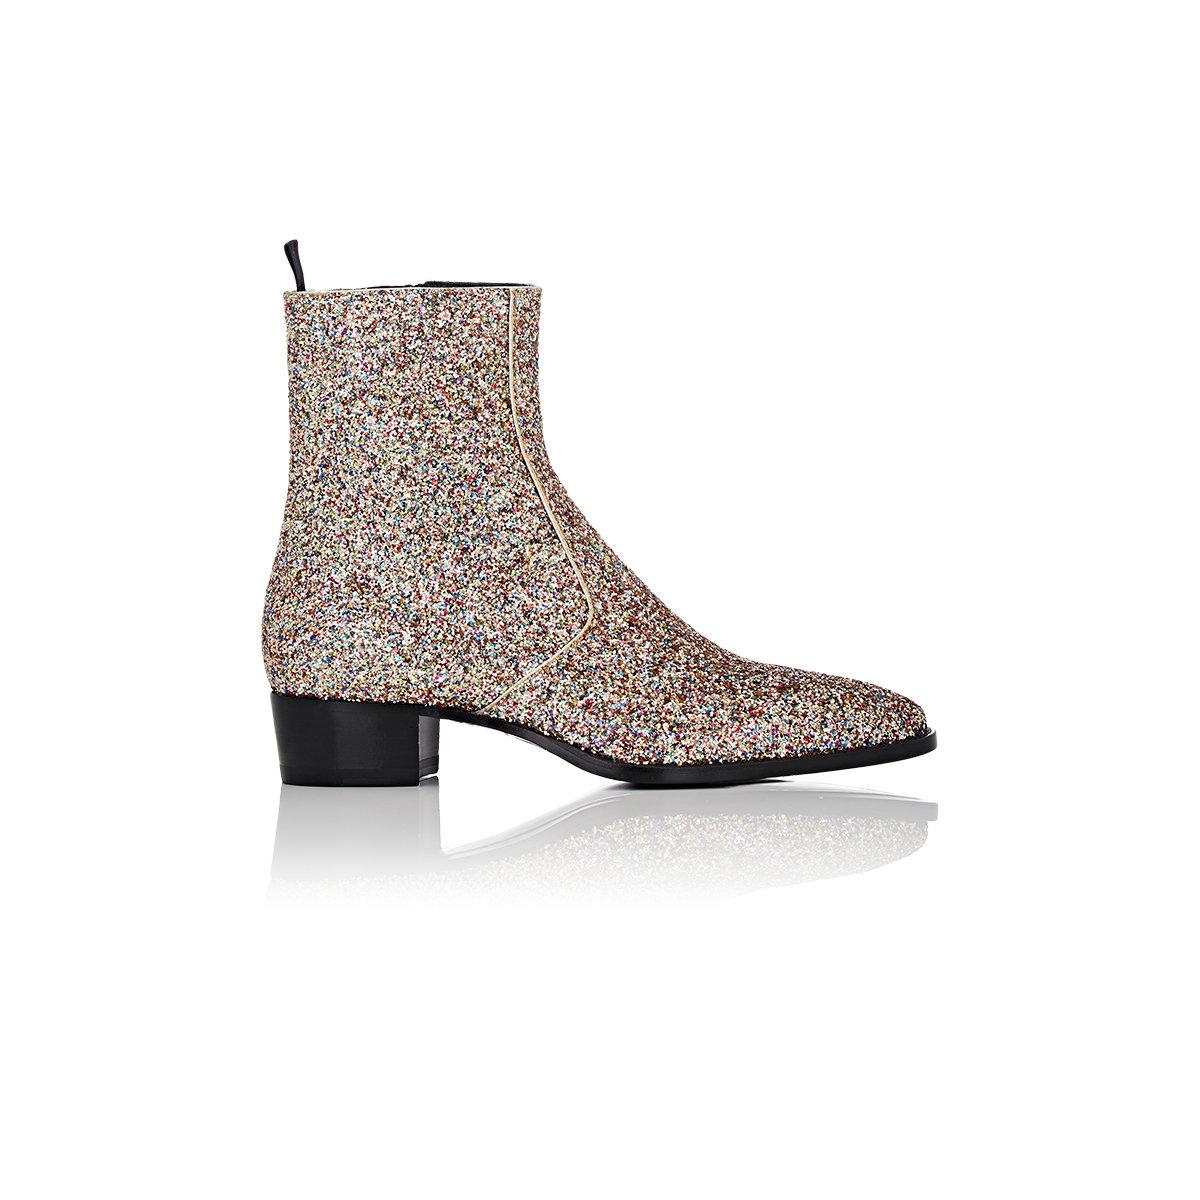 bbf07b40a6e Saint Laurent Glitter-covered Wyatt Boots in Metallic - Lyst